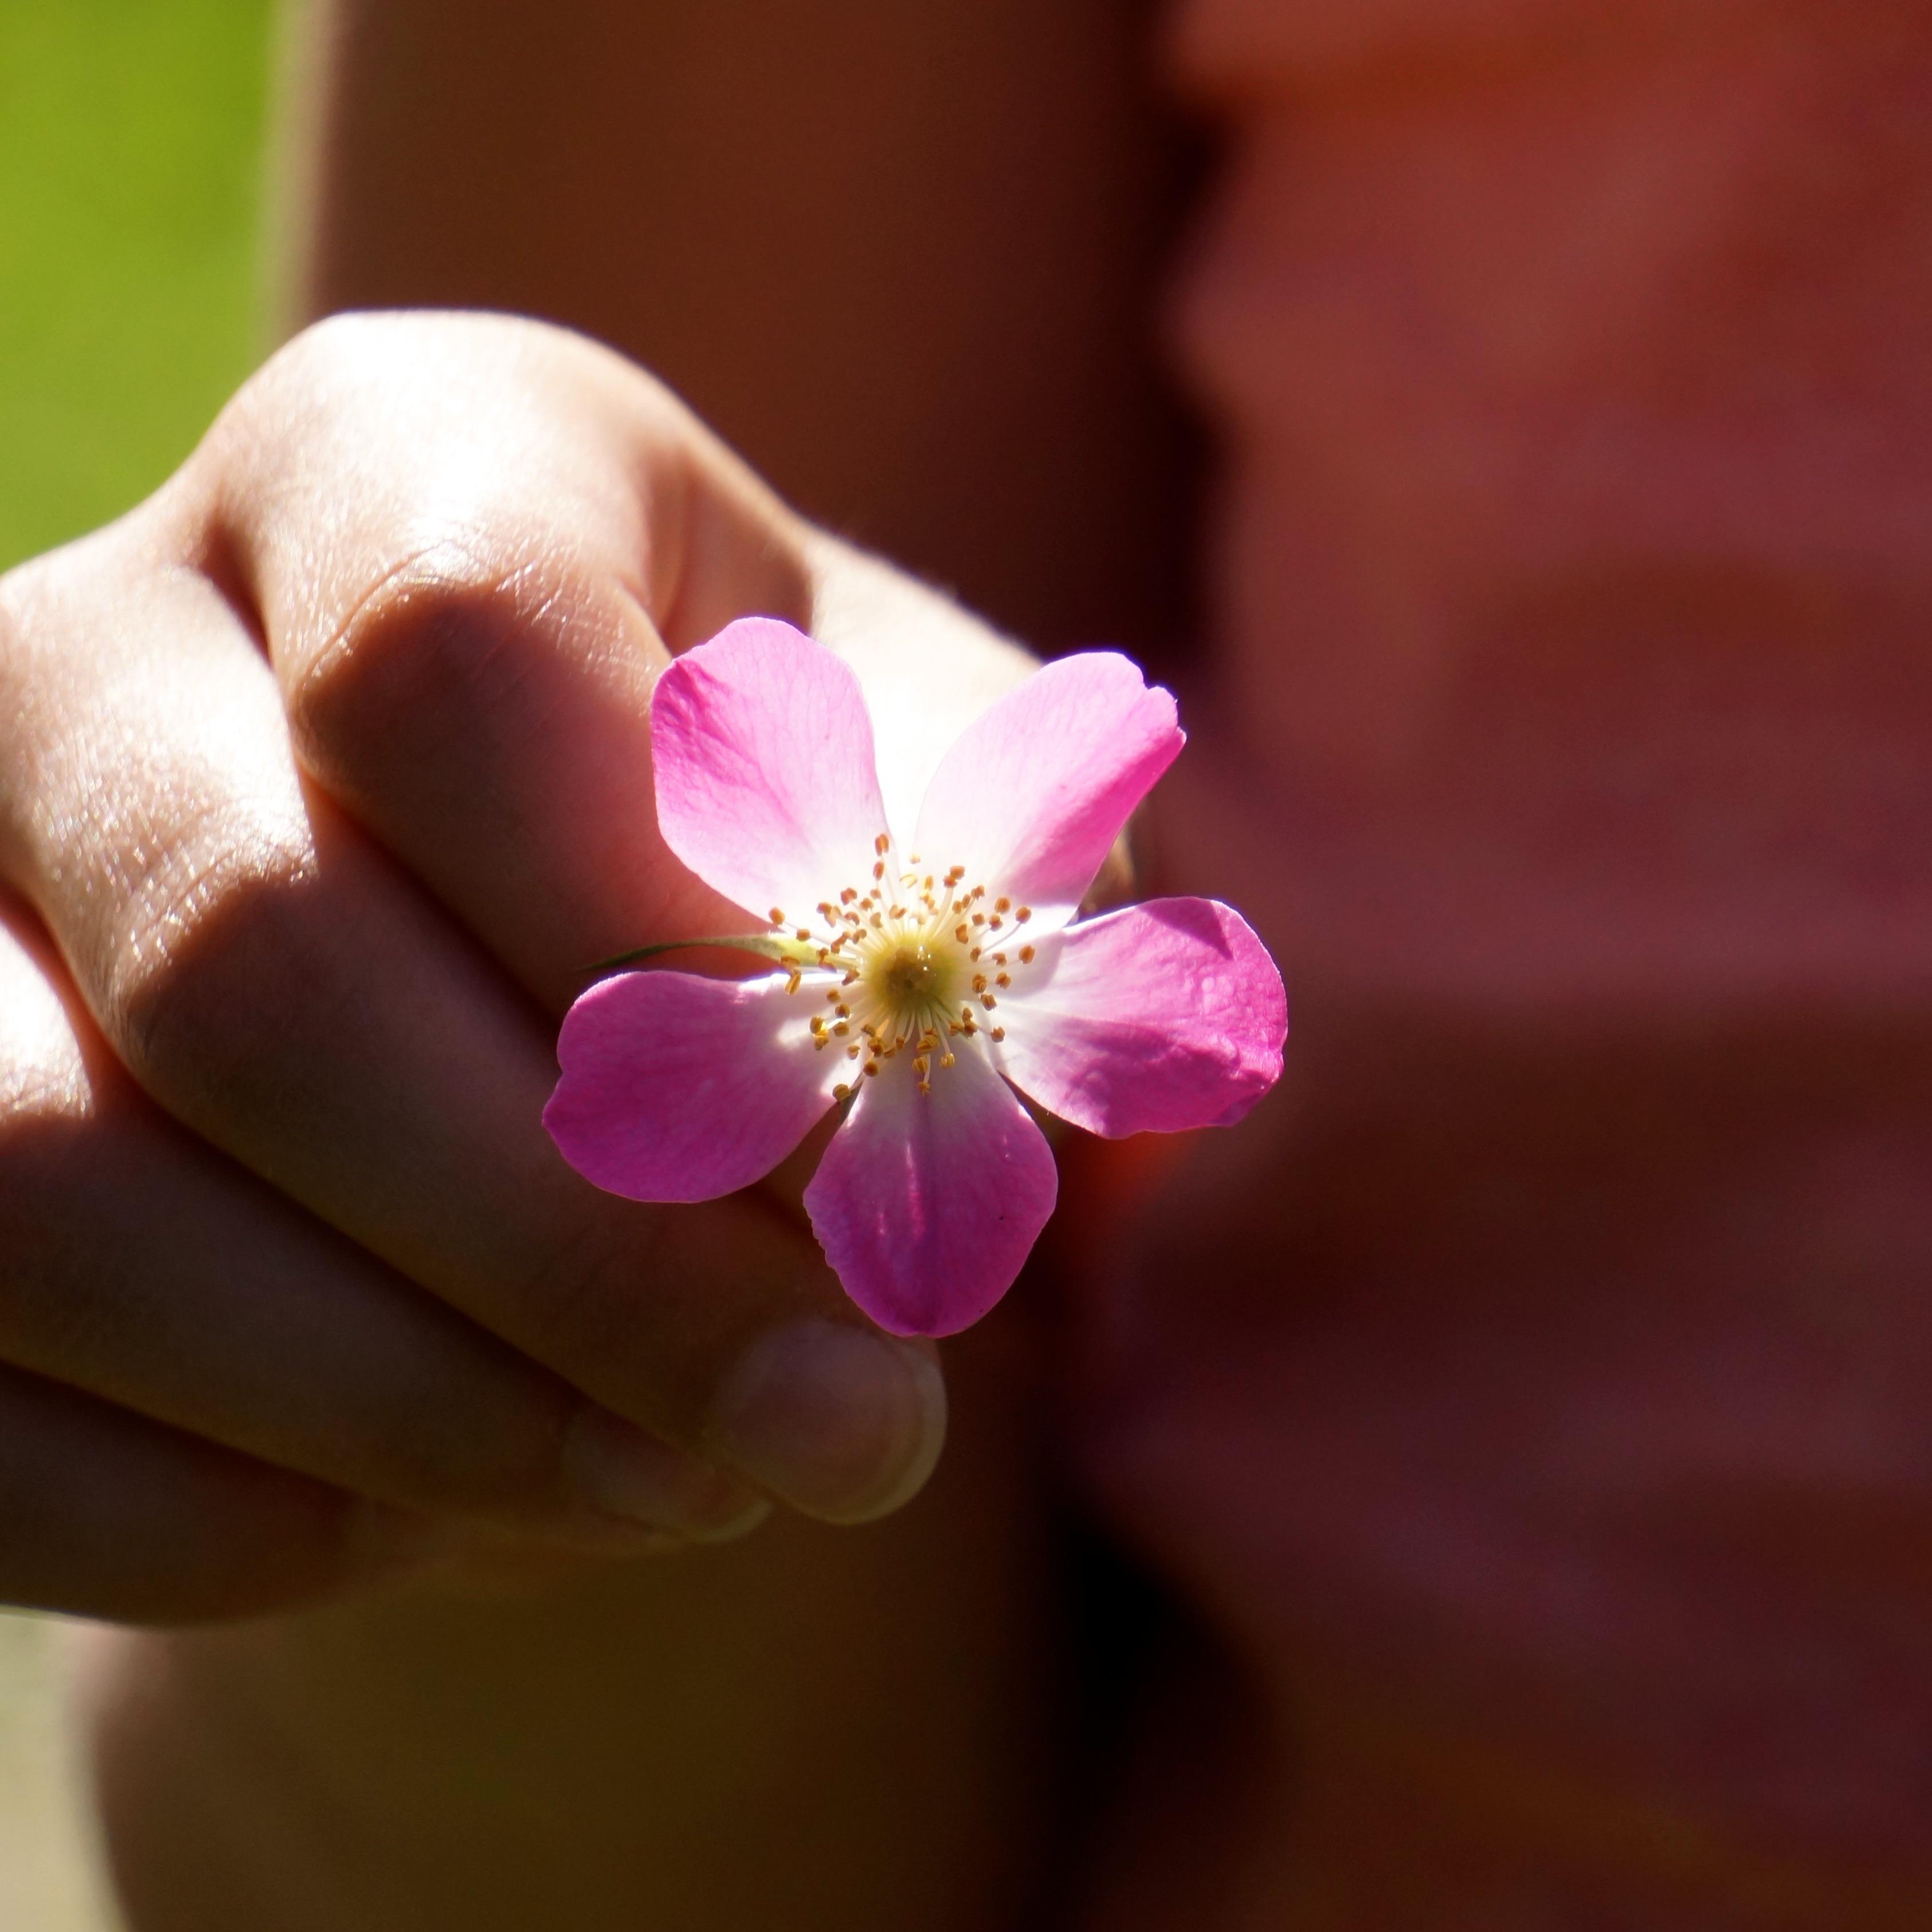 Картинка цветок на ладонях